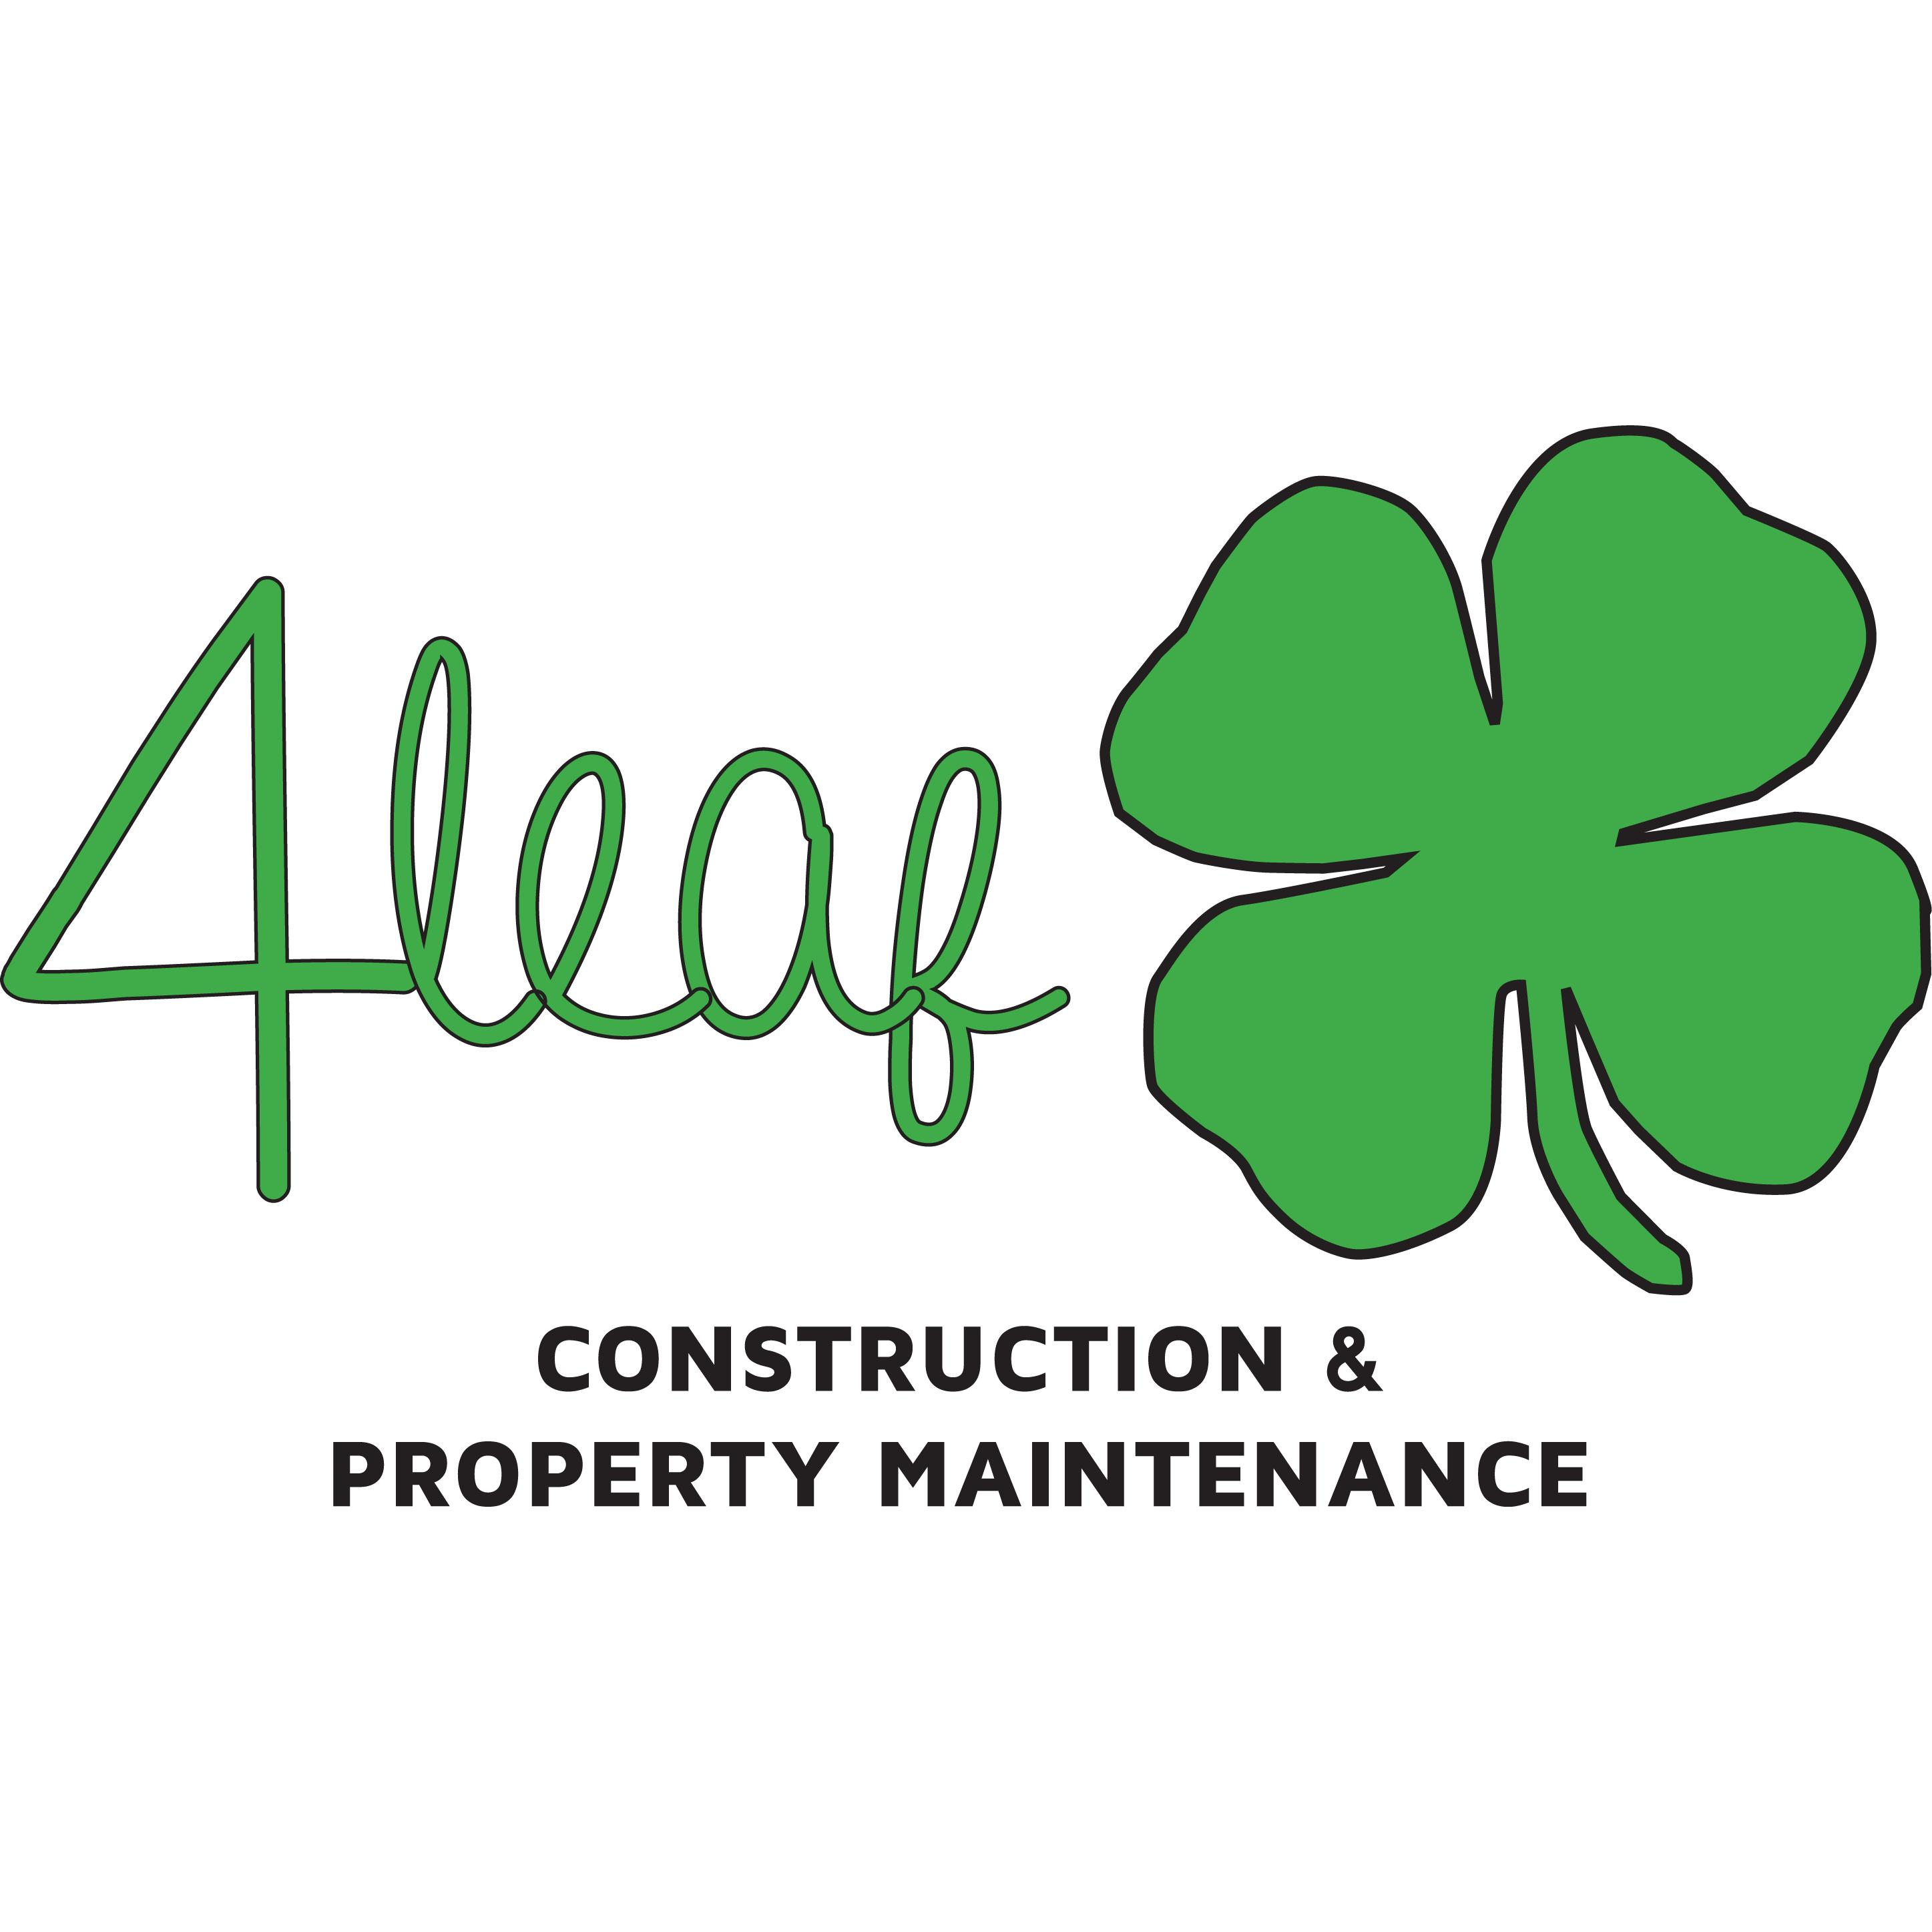 4 Leaf Construction and Property Maintenance, LLC